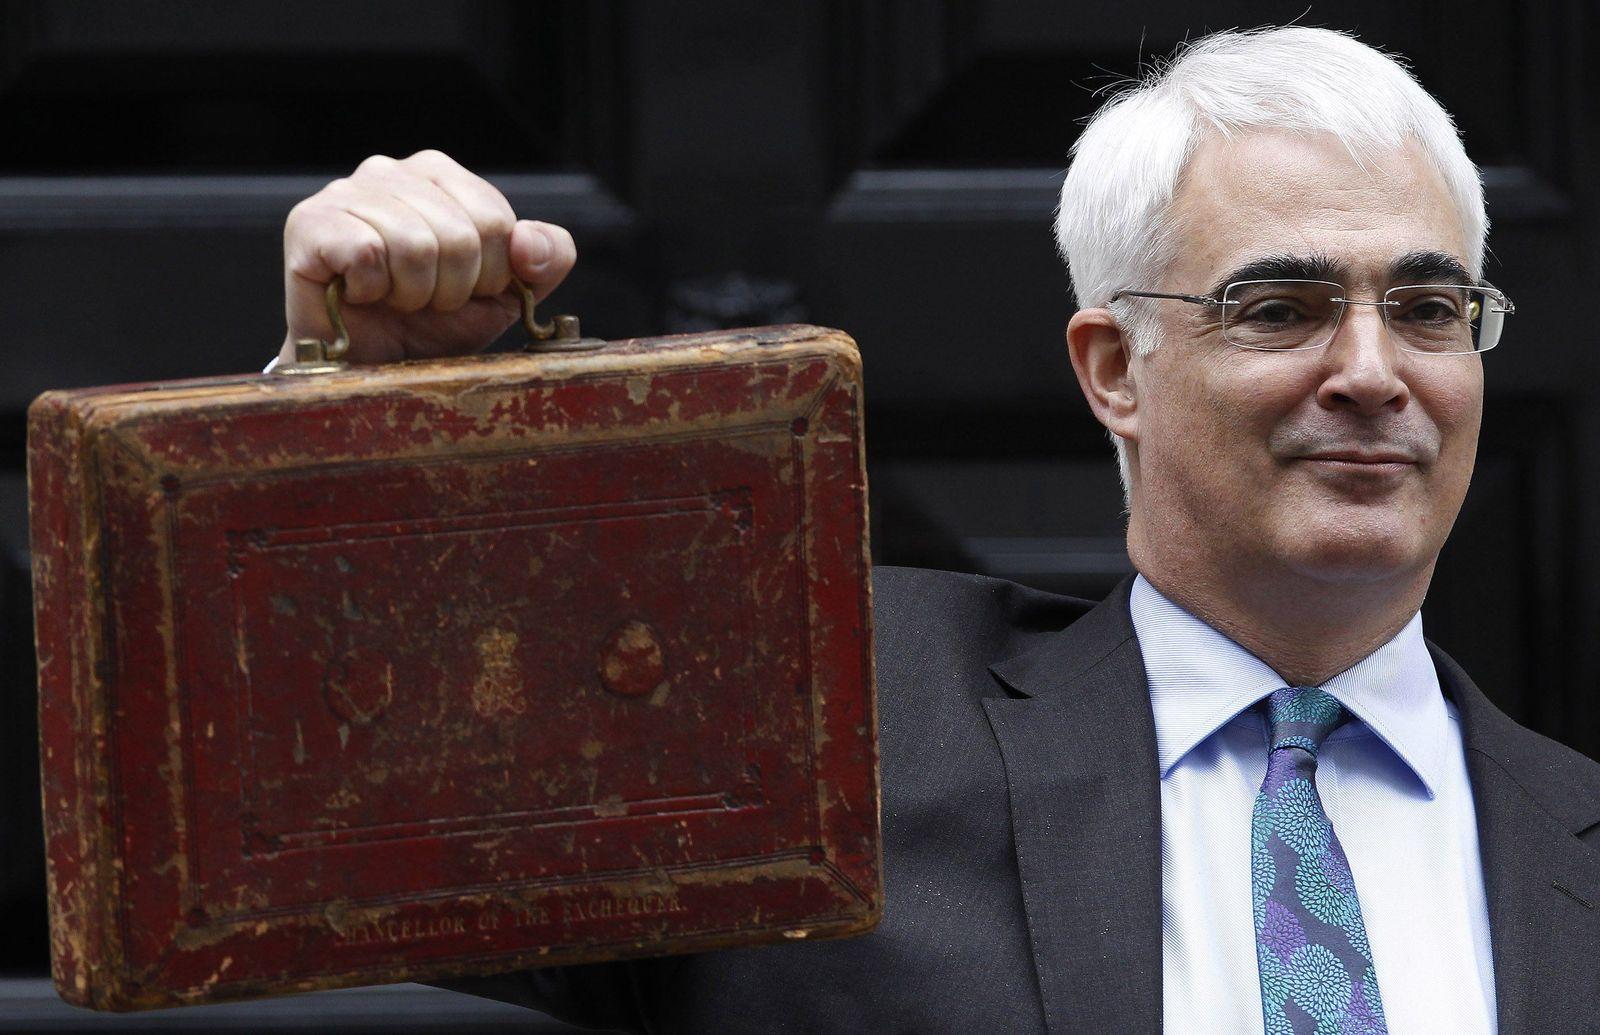 Alistair Darling mit Koffer